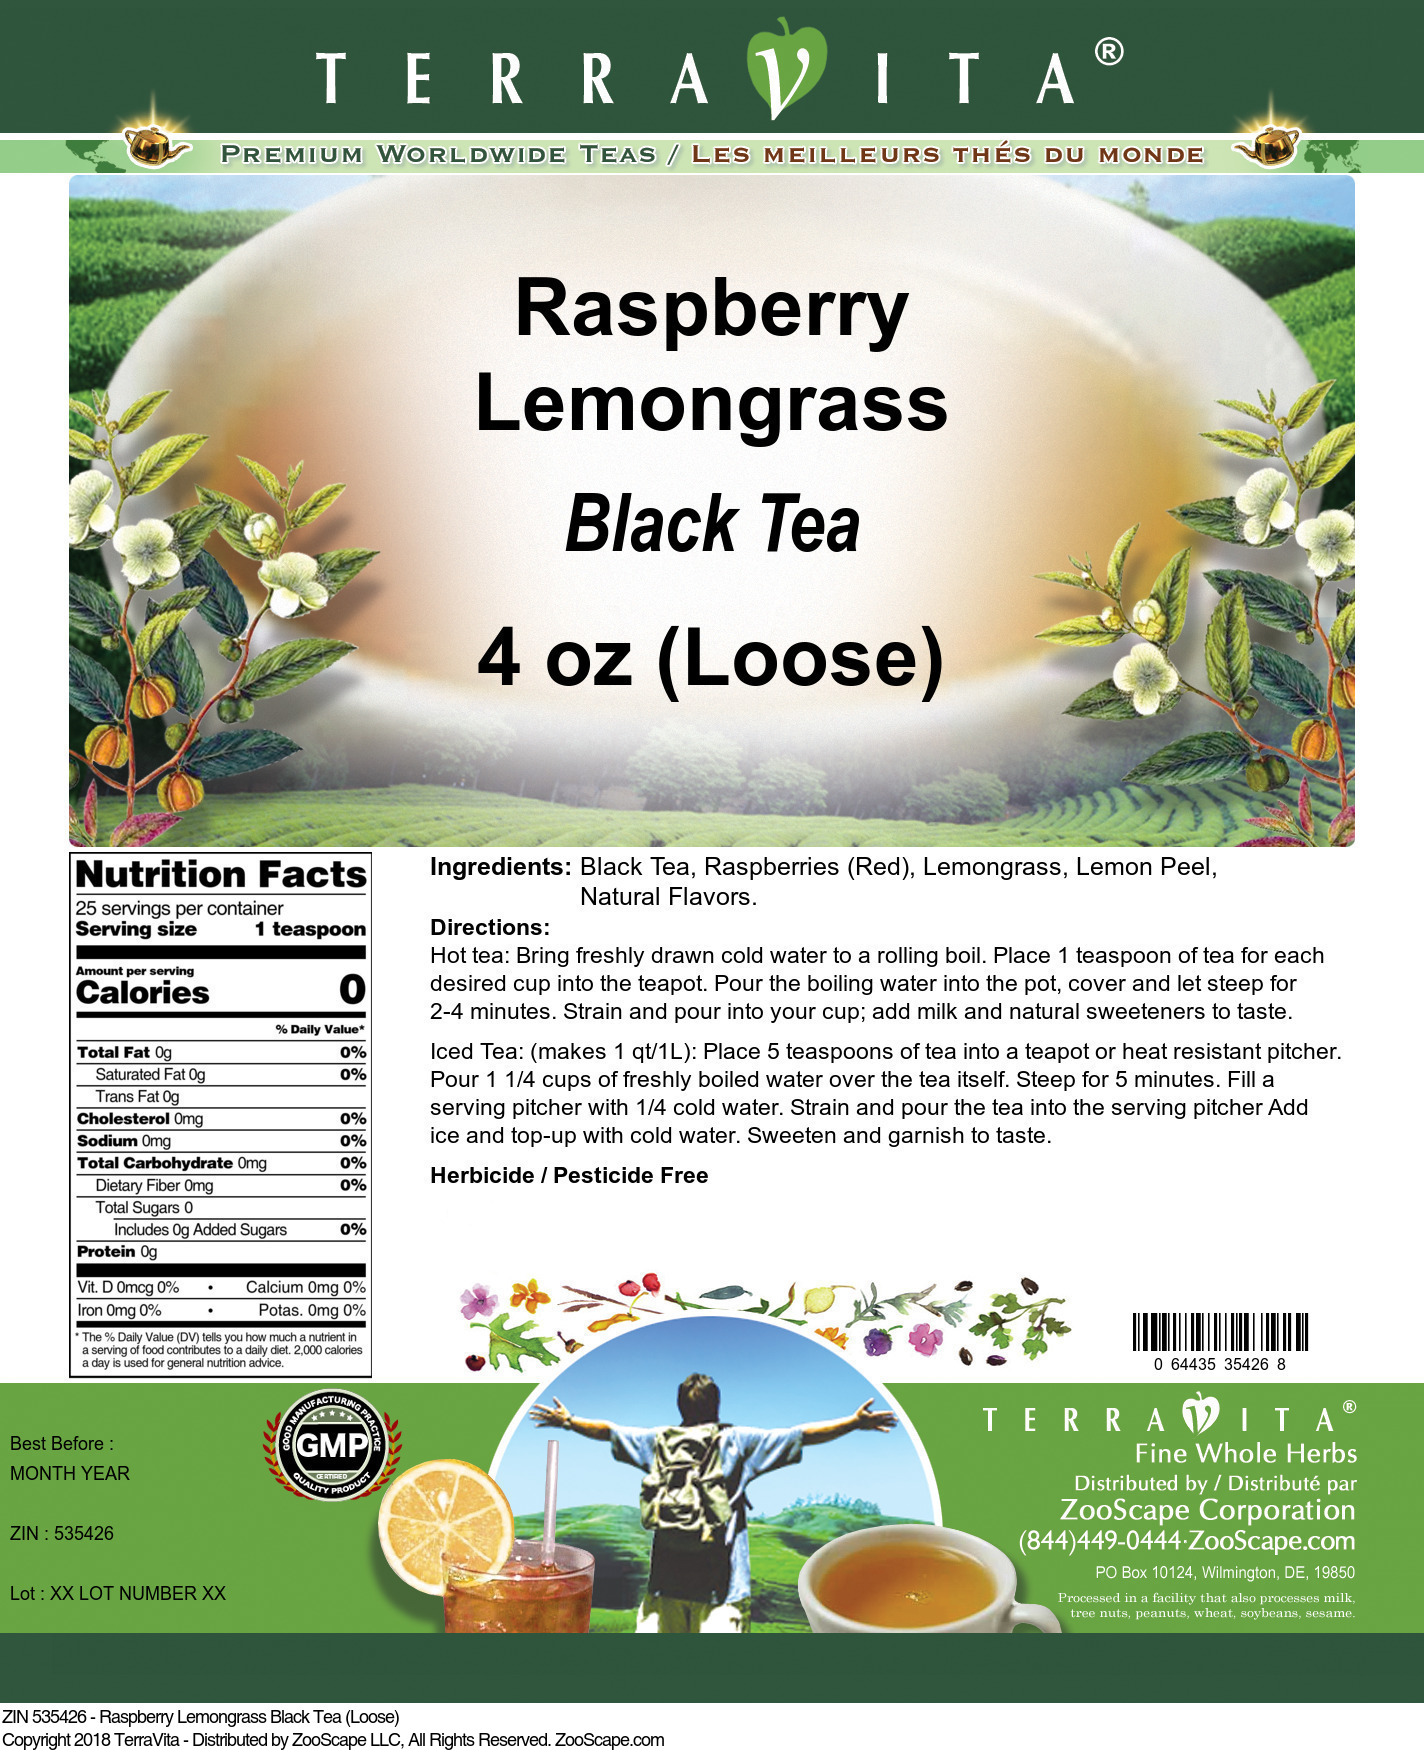 Raspberry Lemongrass Black Tea